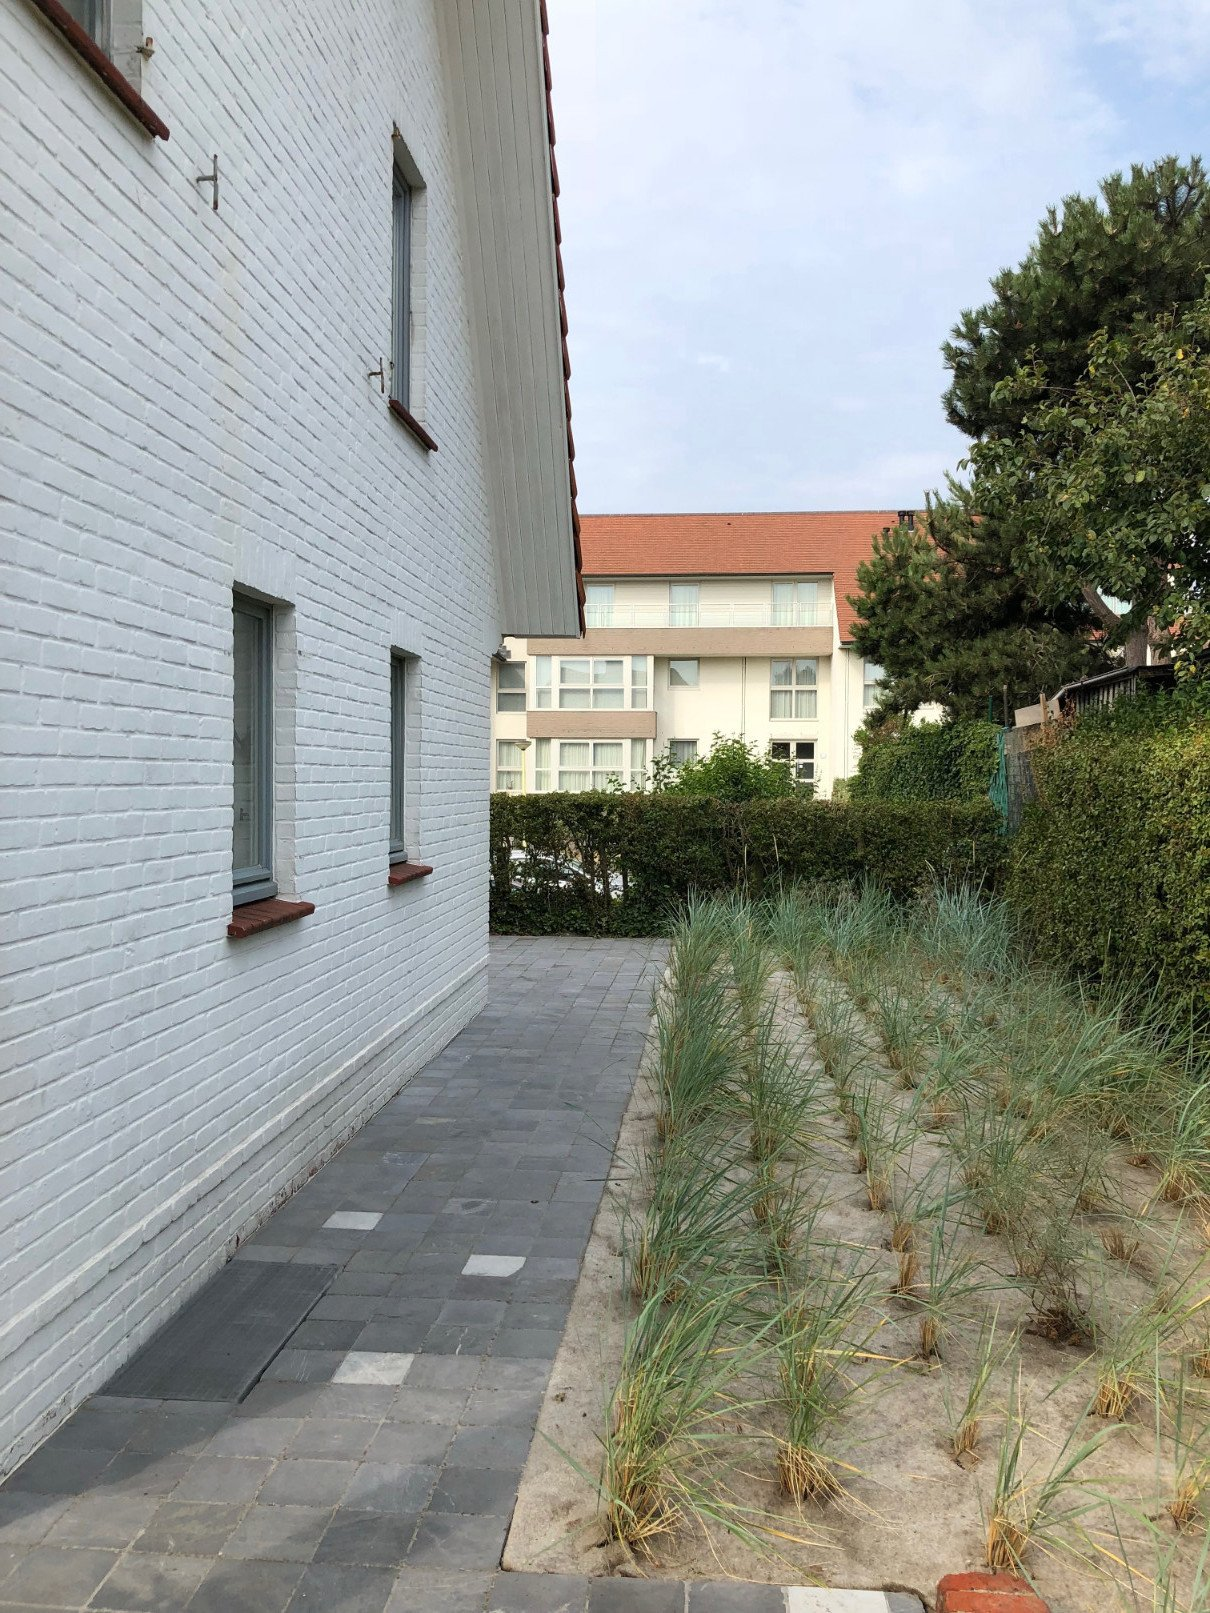 Rietveldprojects-Villa Were Di - Te Koop : Te Huur (per week)25.jpg